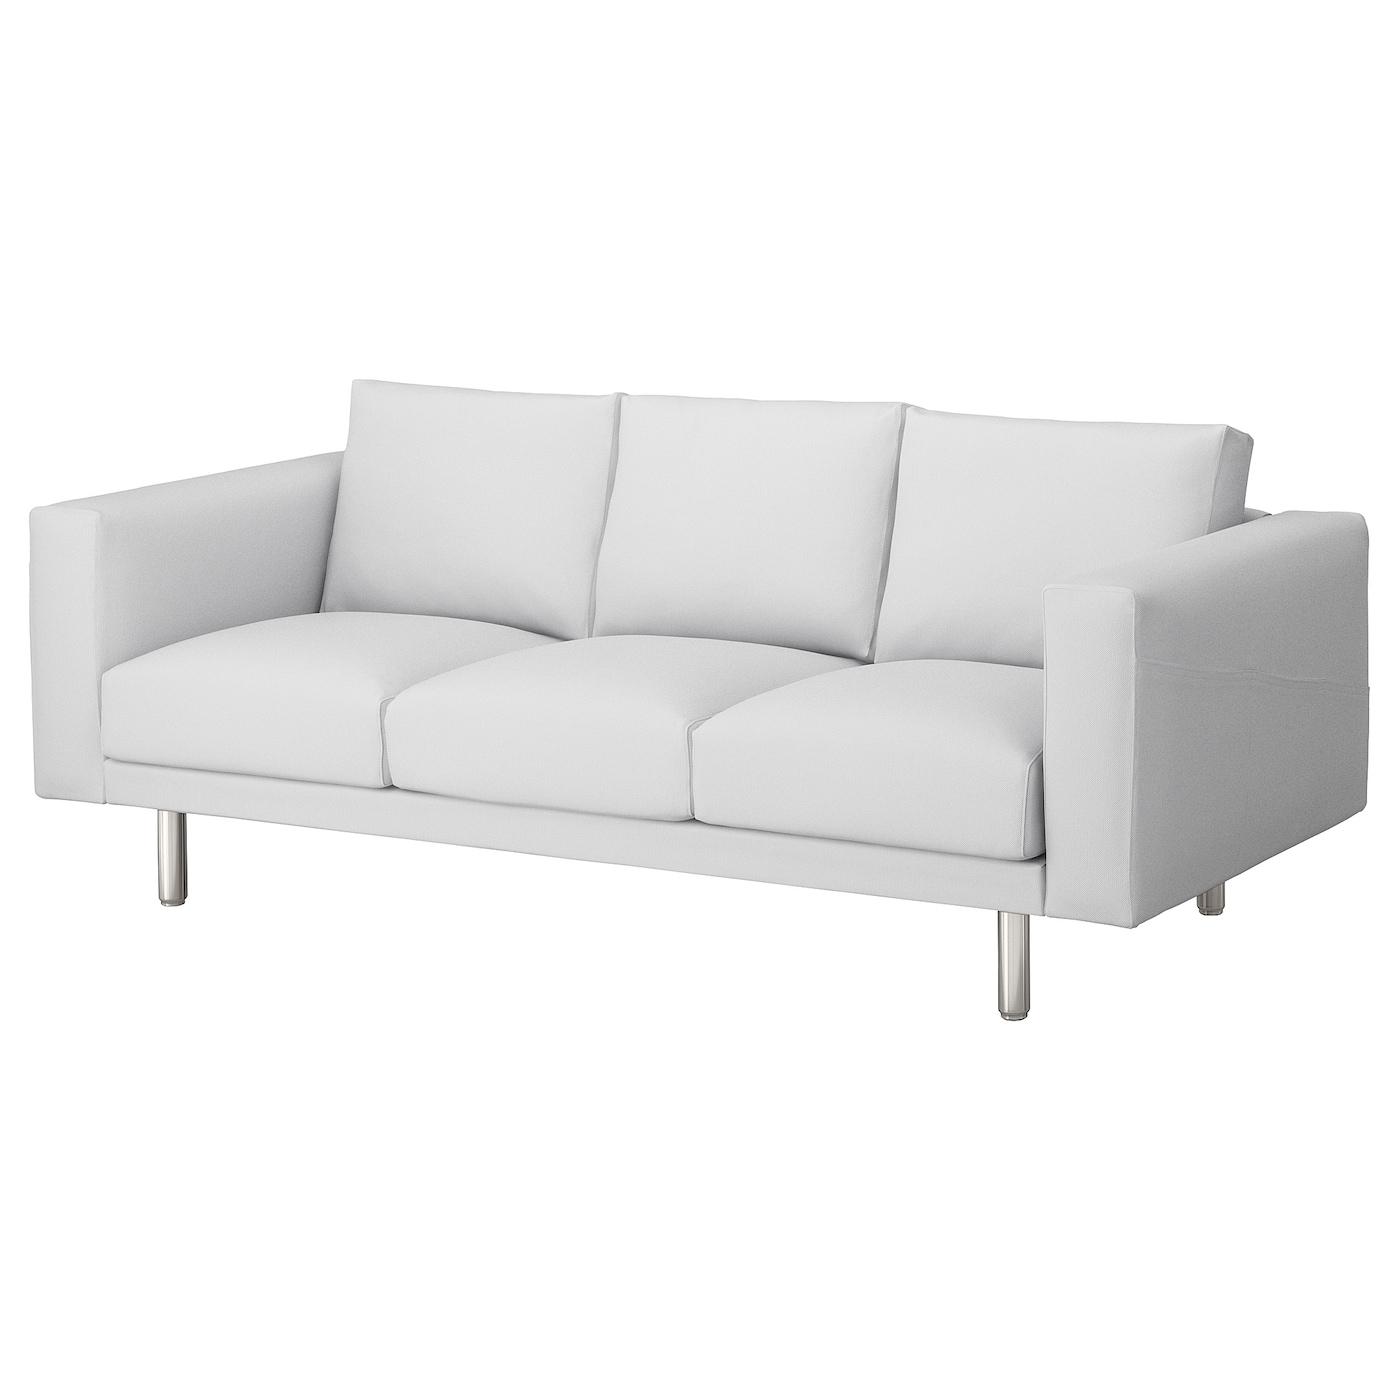 norsborg 3 seat sofa finnsta white metal ikea. Black Bedroom Furniture Sets. Home Design Ideas